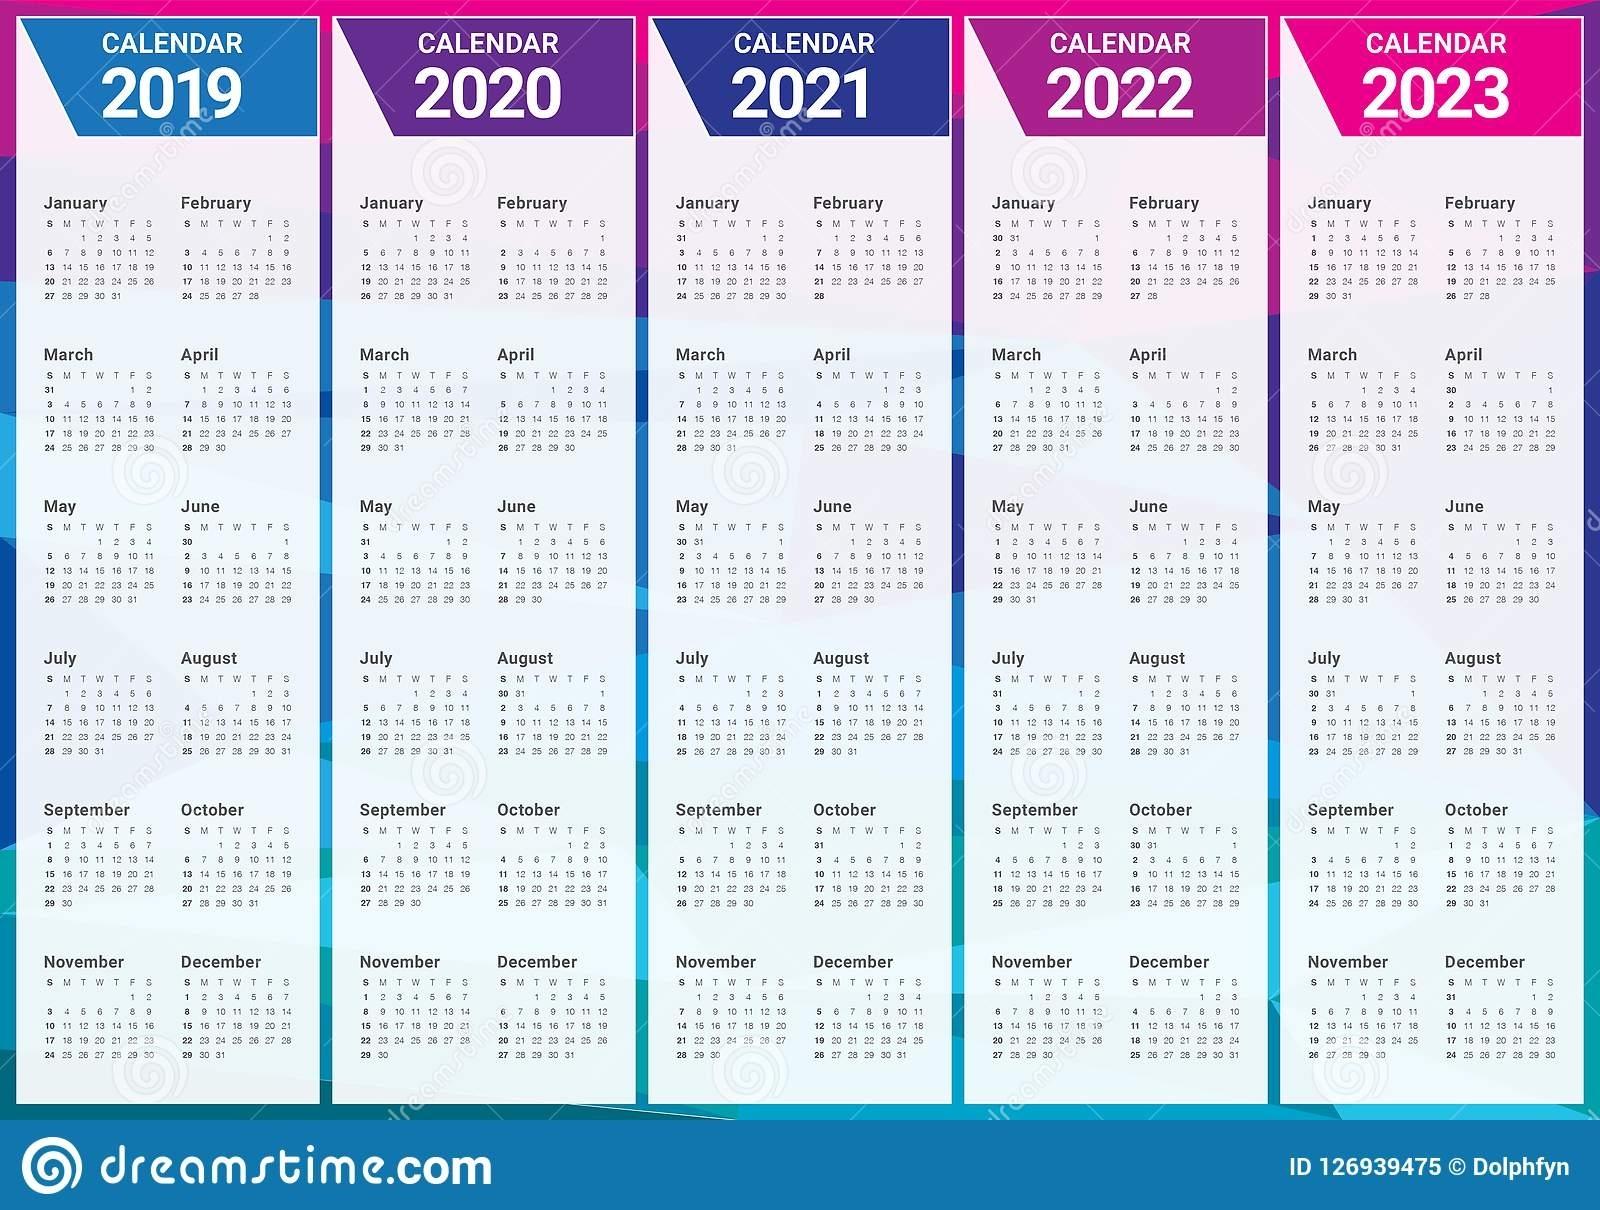 Year 2019 2020 2021 2022 2023 Calendar Vector Design Template Stock Vector - Illustration Of